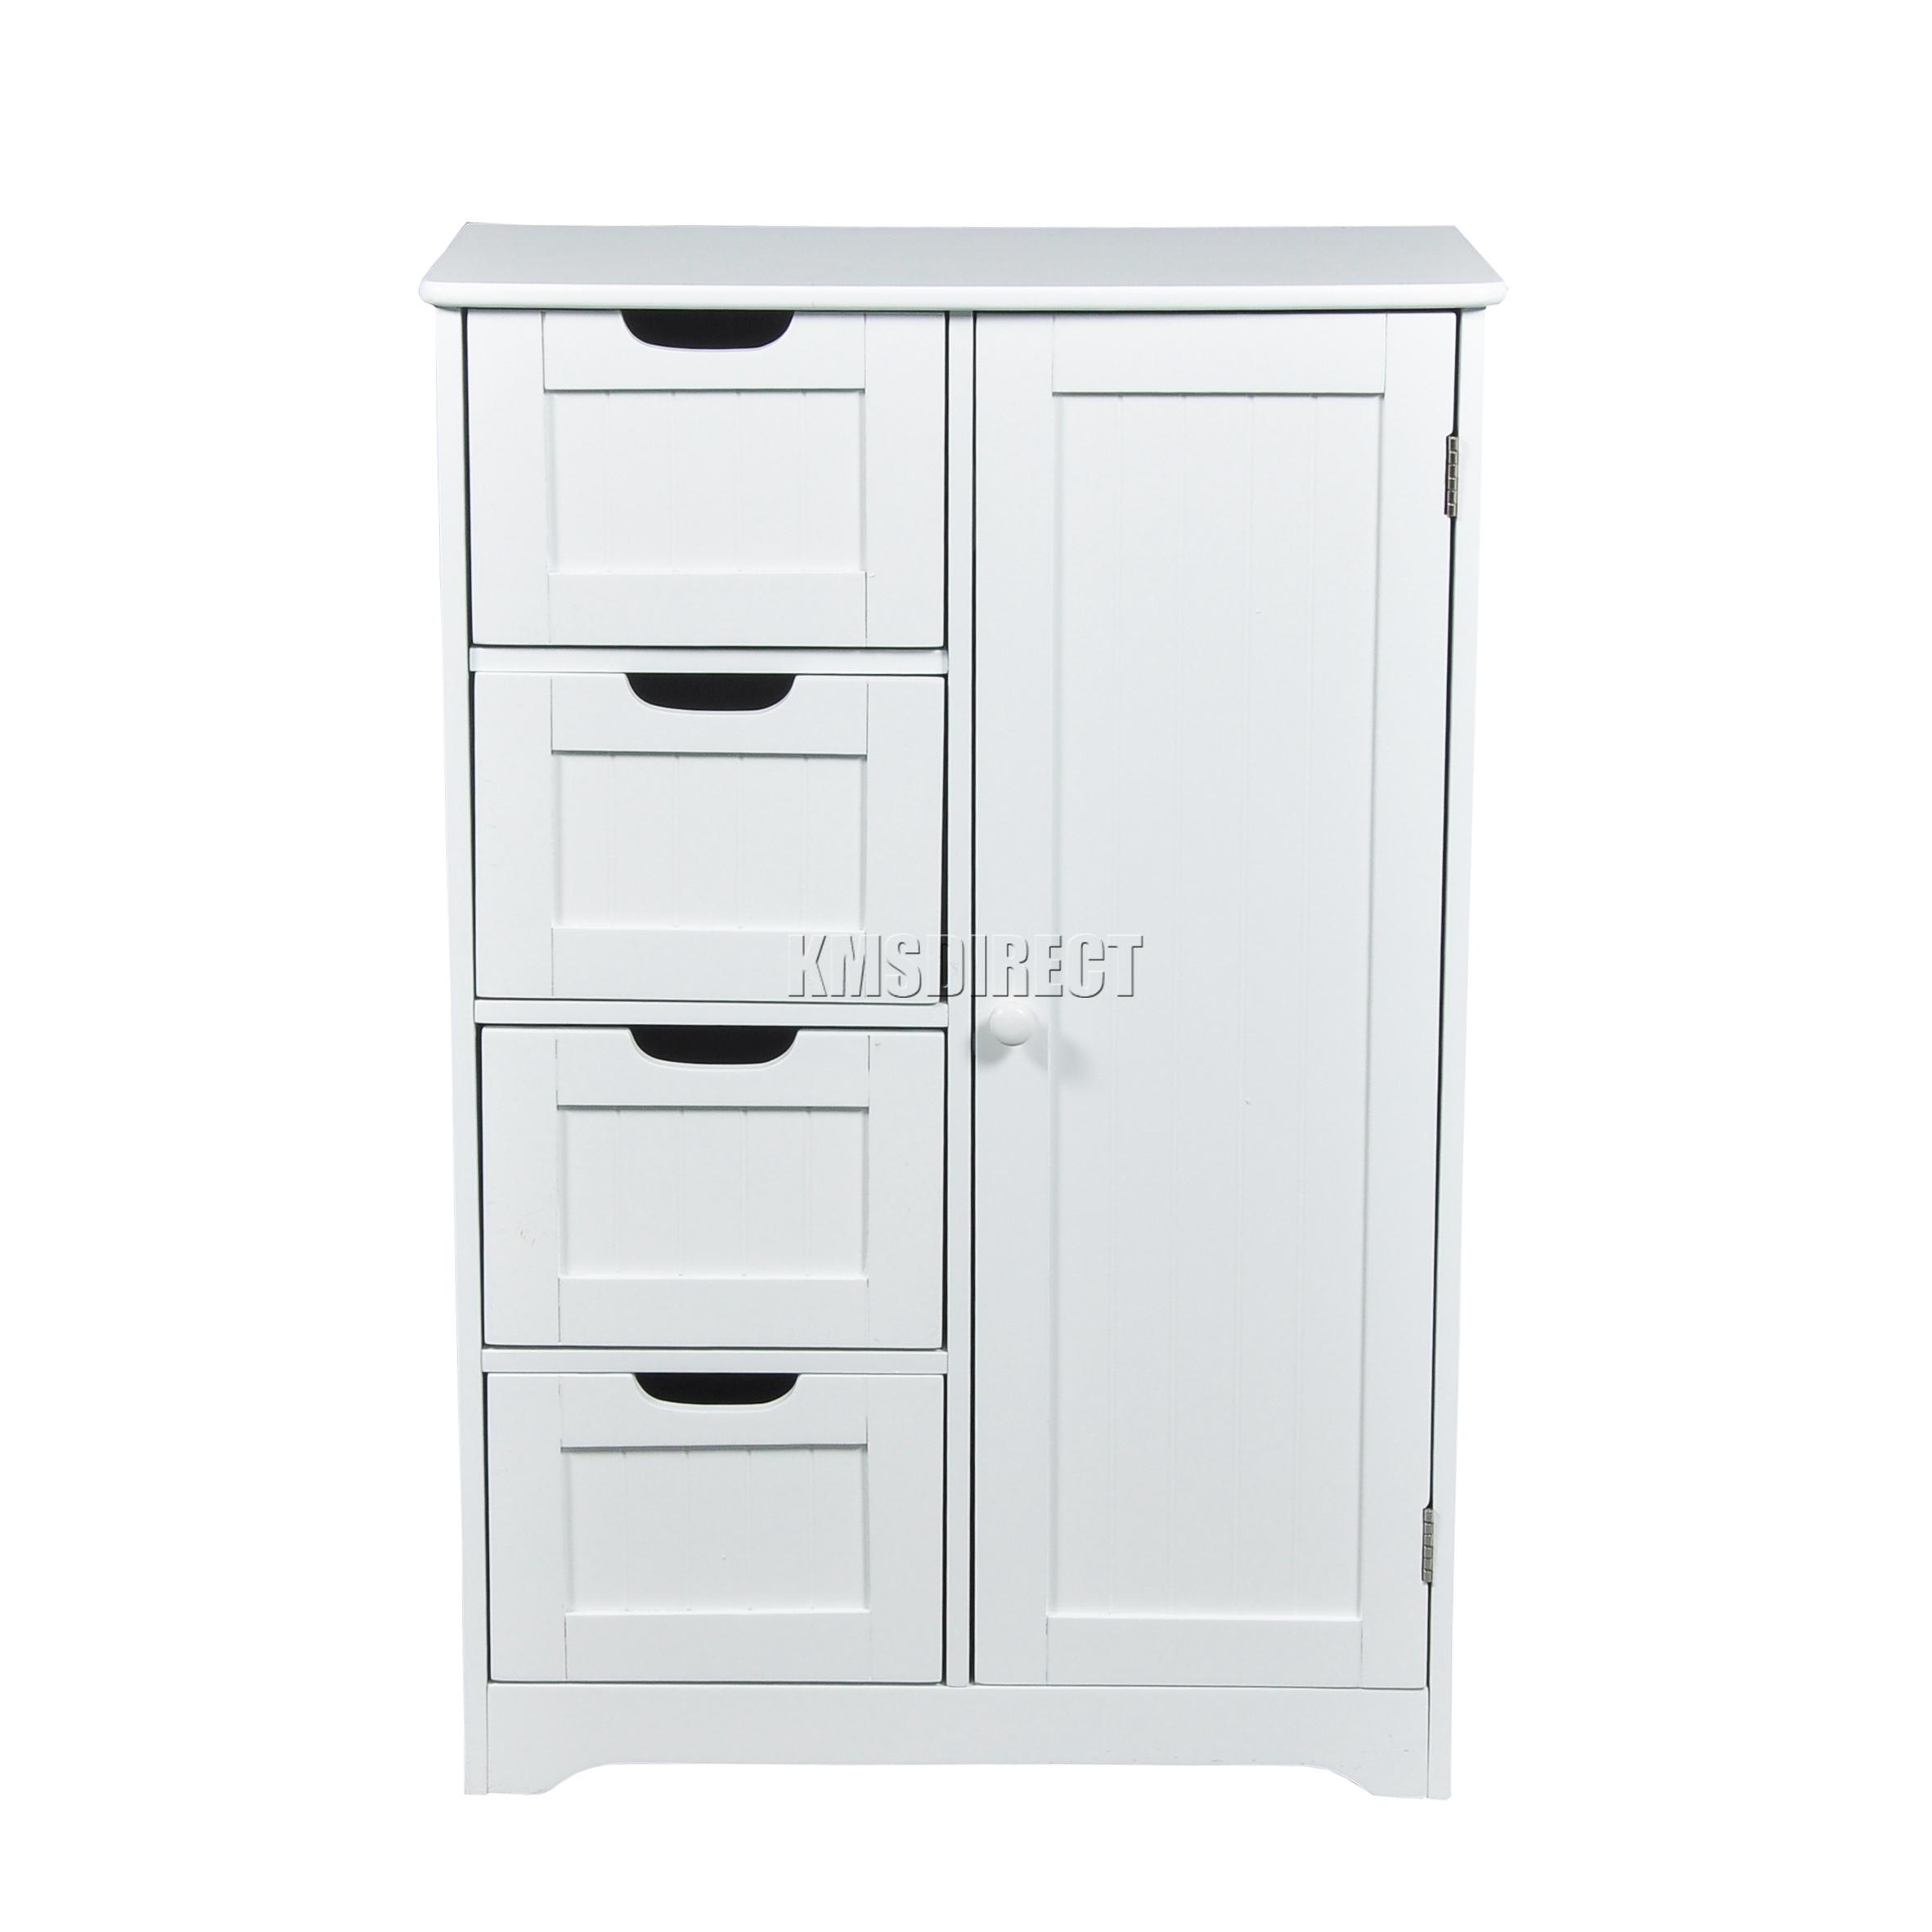 4 Drawer Bathroom Cabinet - Sentinel foxhunter white wooden 4 drawer bathroom storage cupboard cabinet standing unit